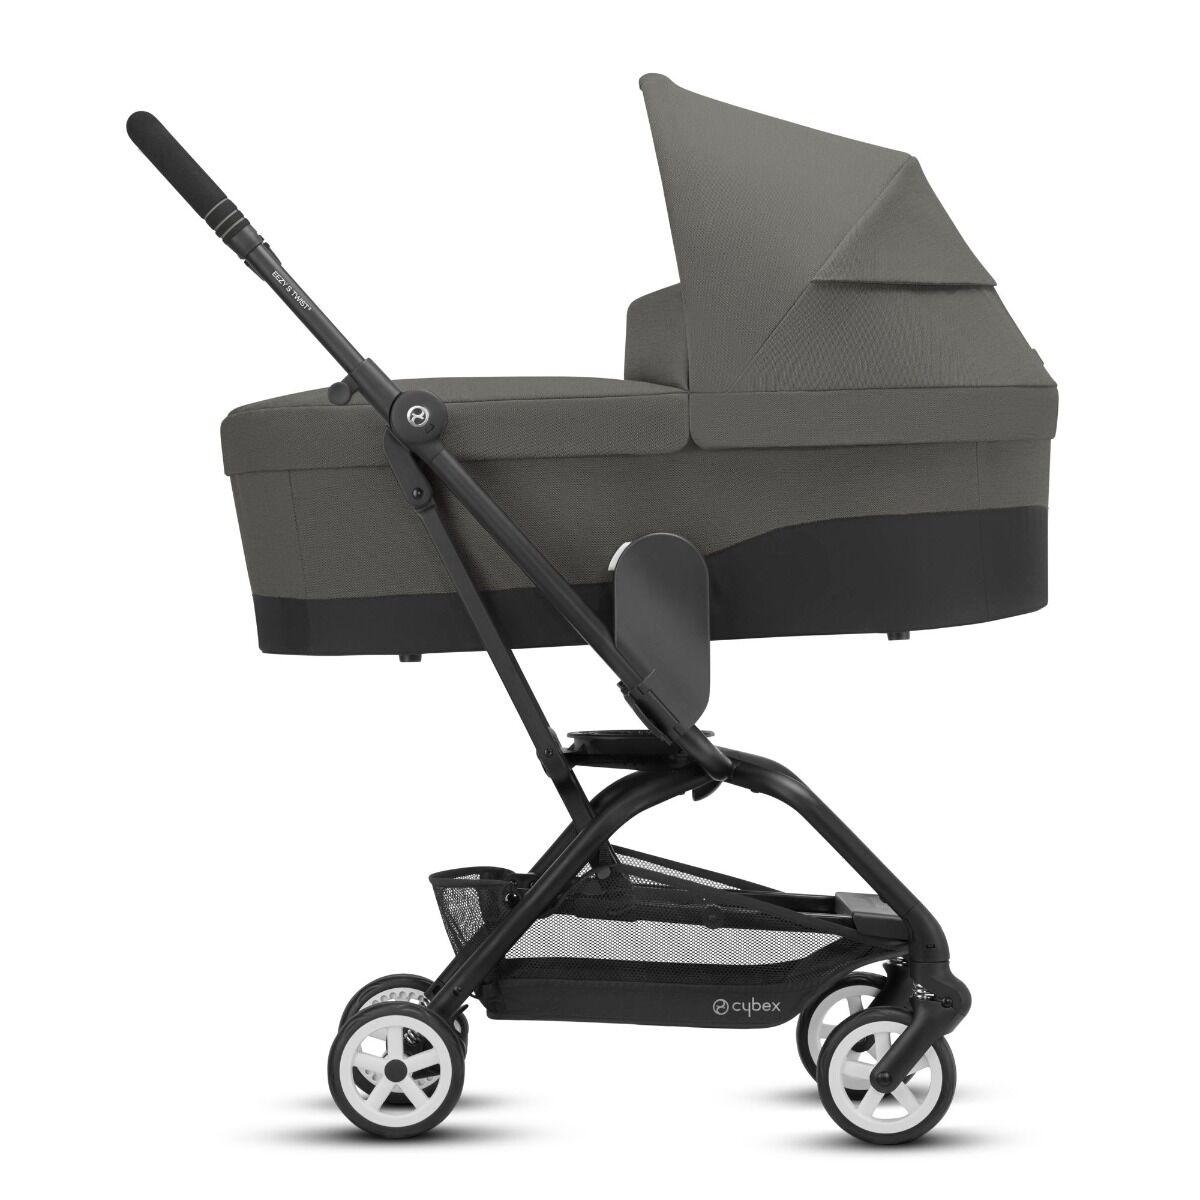 Cybex Kinderwagen 2 in 1 Eezy S Twist 2 Soho Grey Black Frame